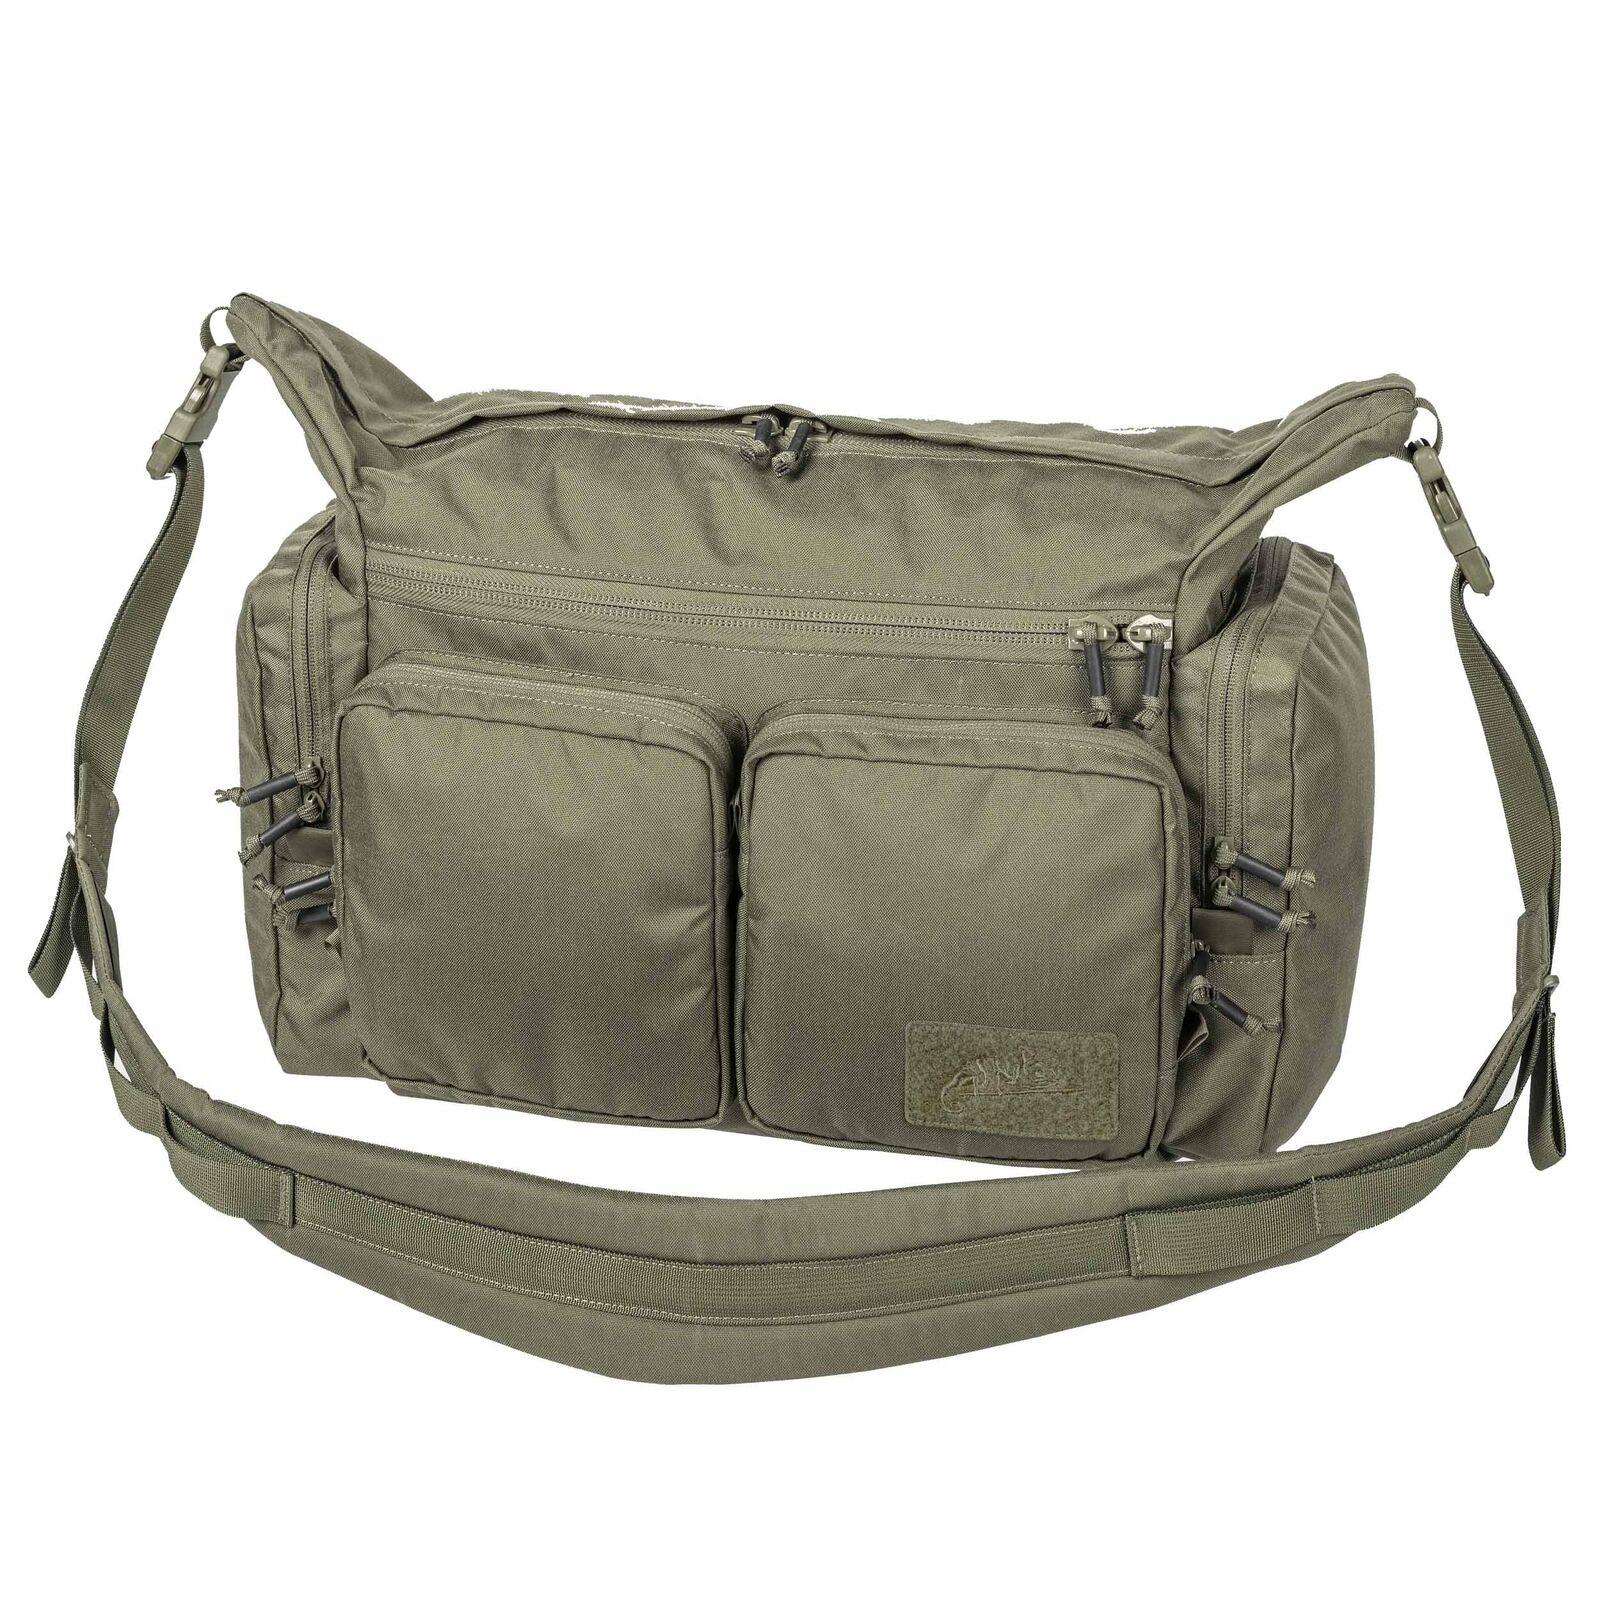 HELIKON-Tex Wombat mk2 Shoulder Bag-Cordura-Adaptive vert